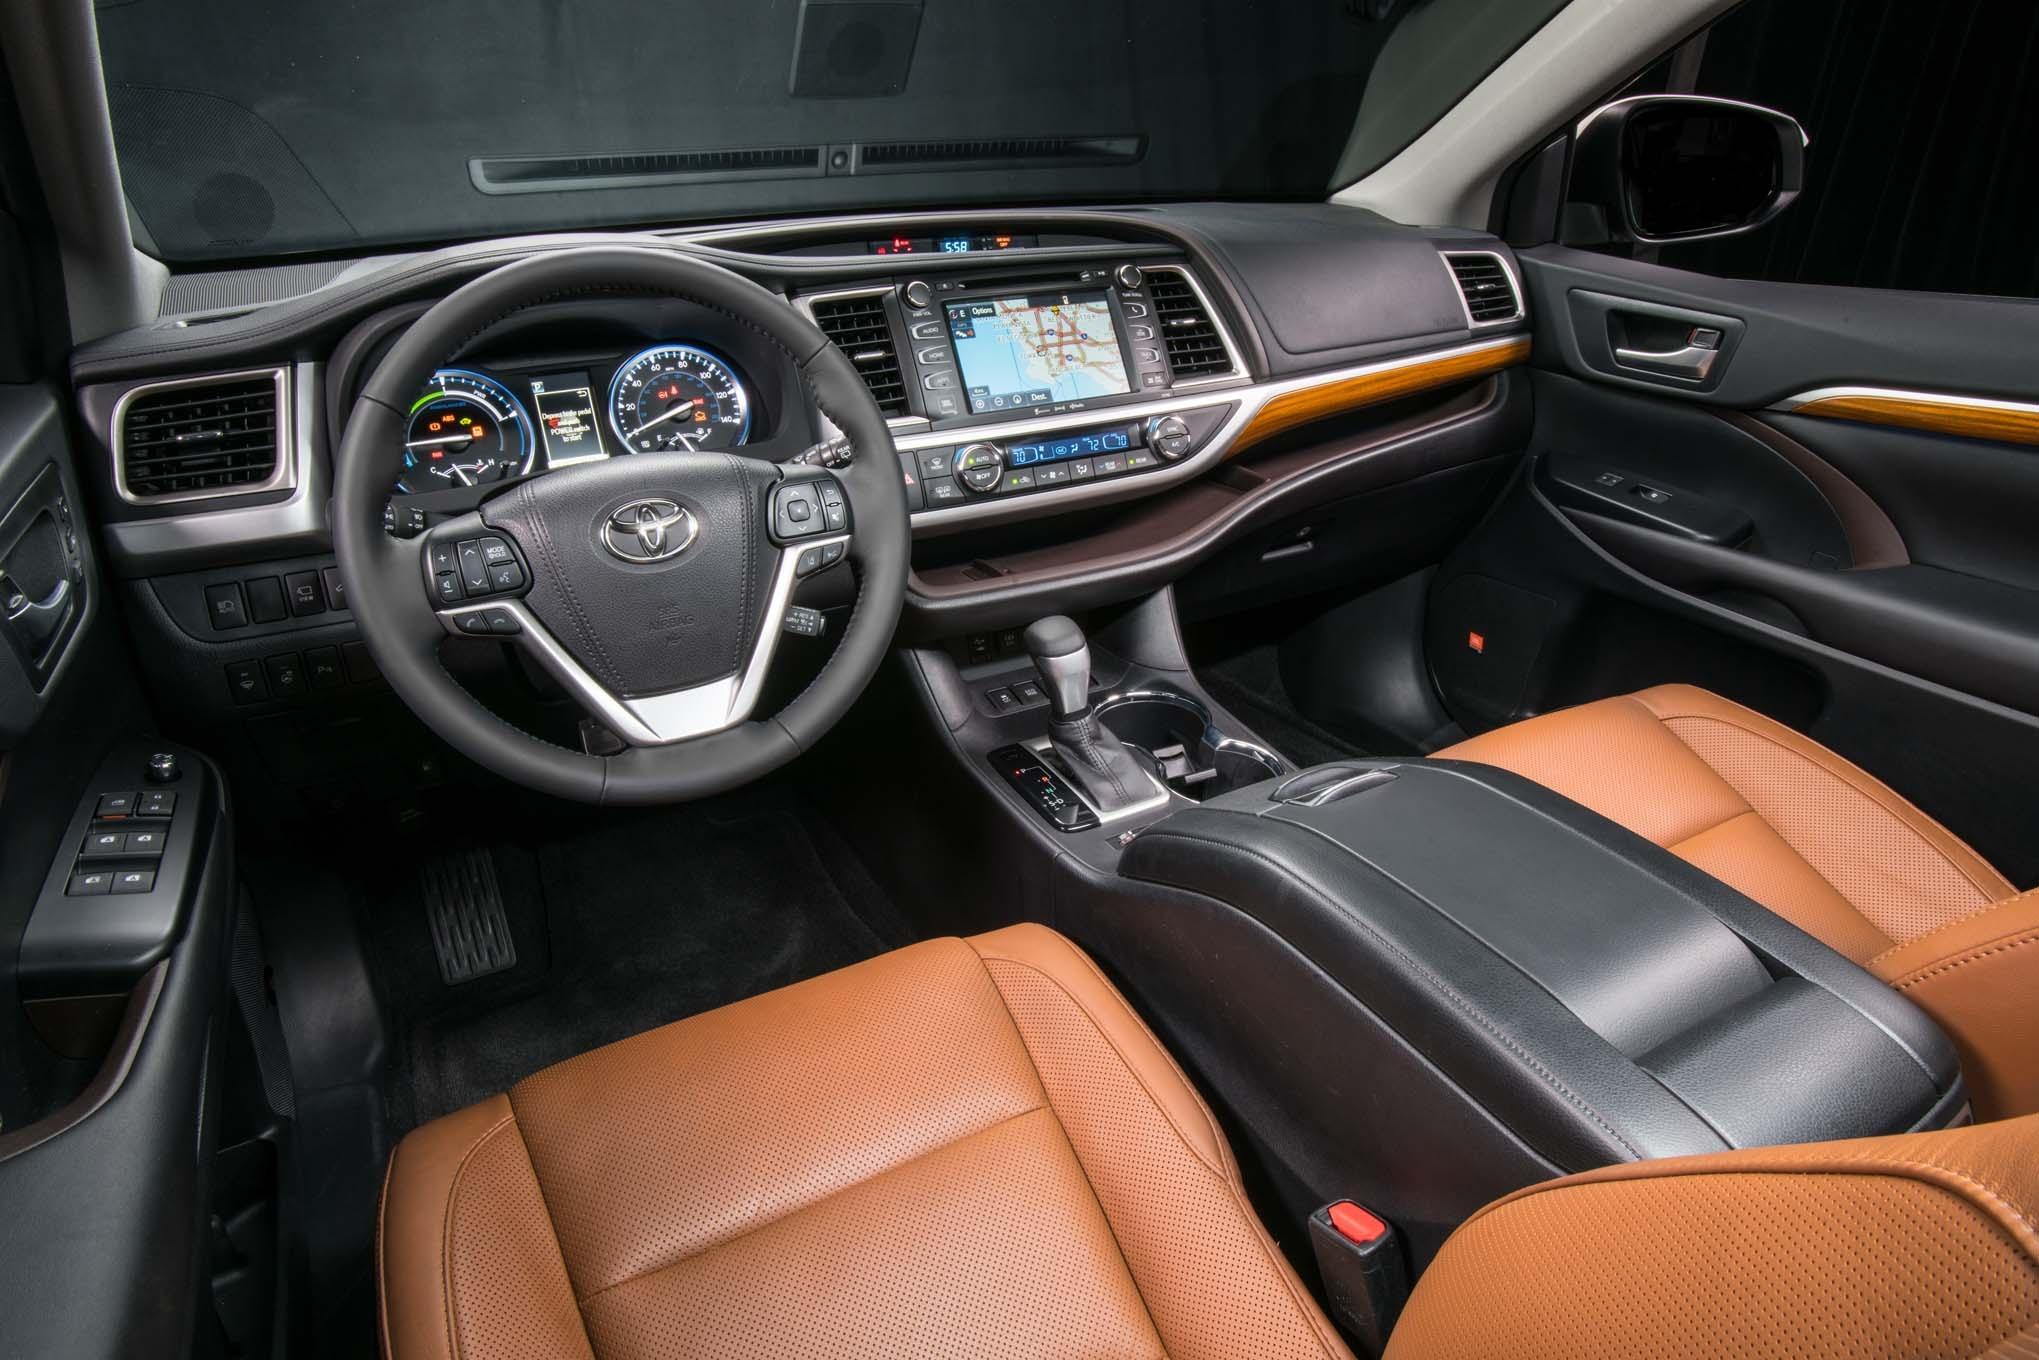 2017 Toyota Highlander Hybrid Limited Platinum interior 02